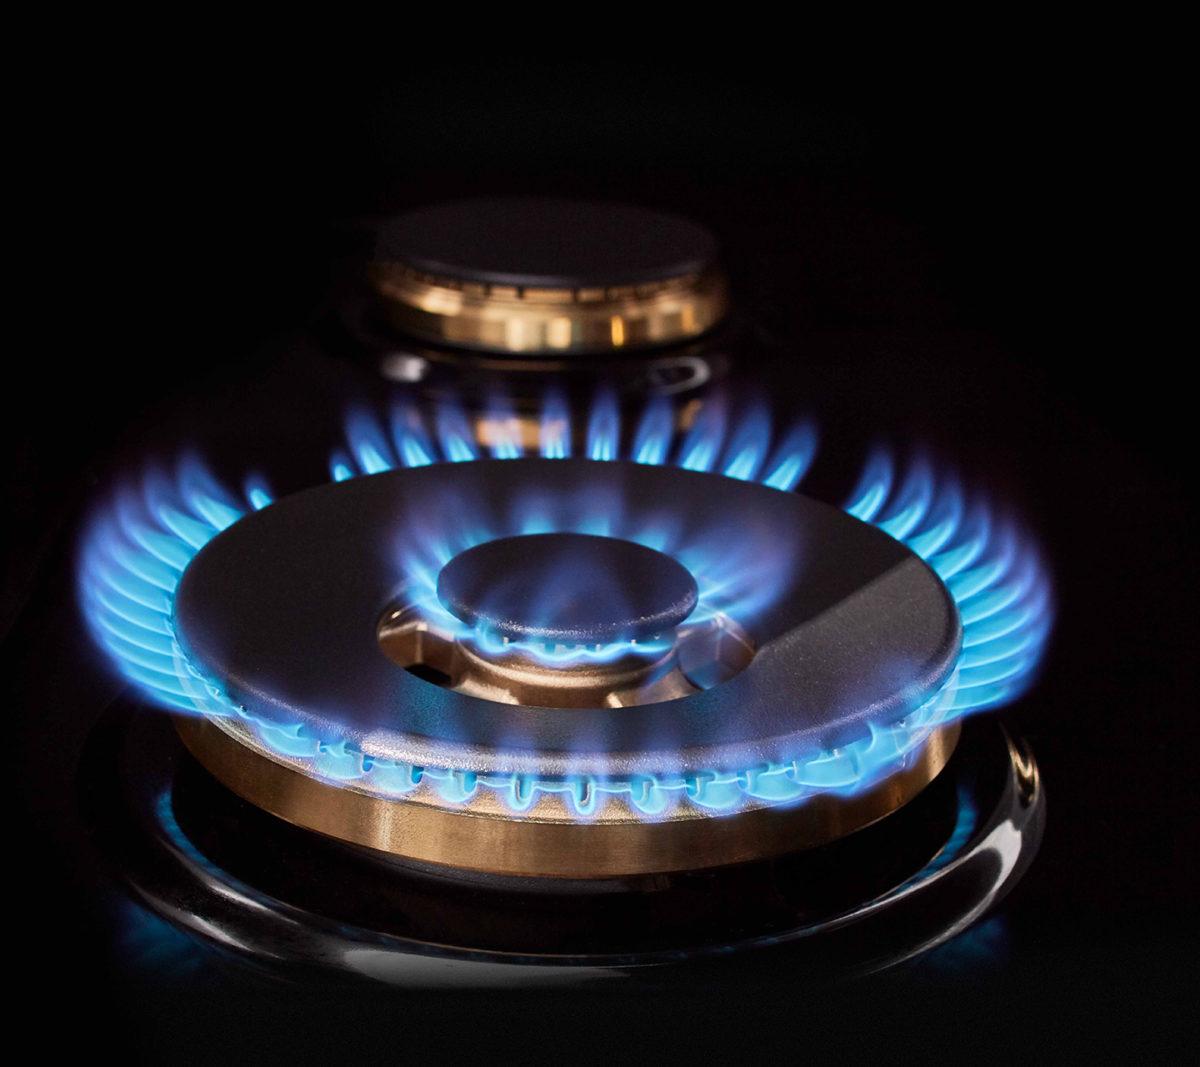 SKS dual burner